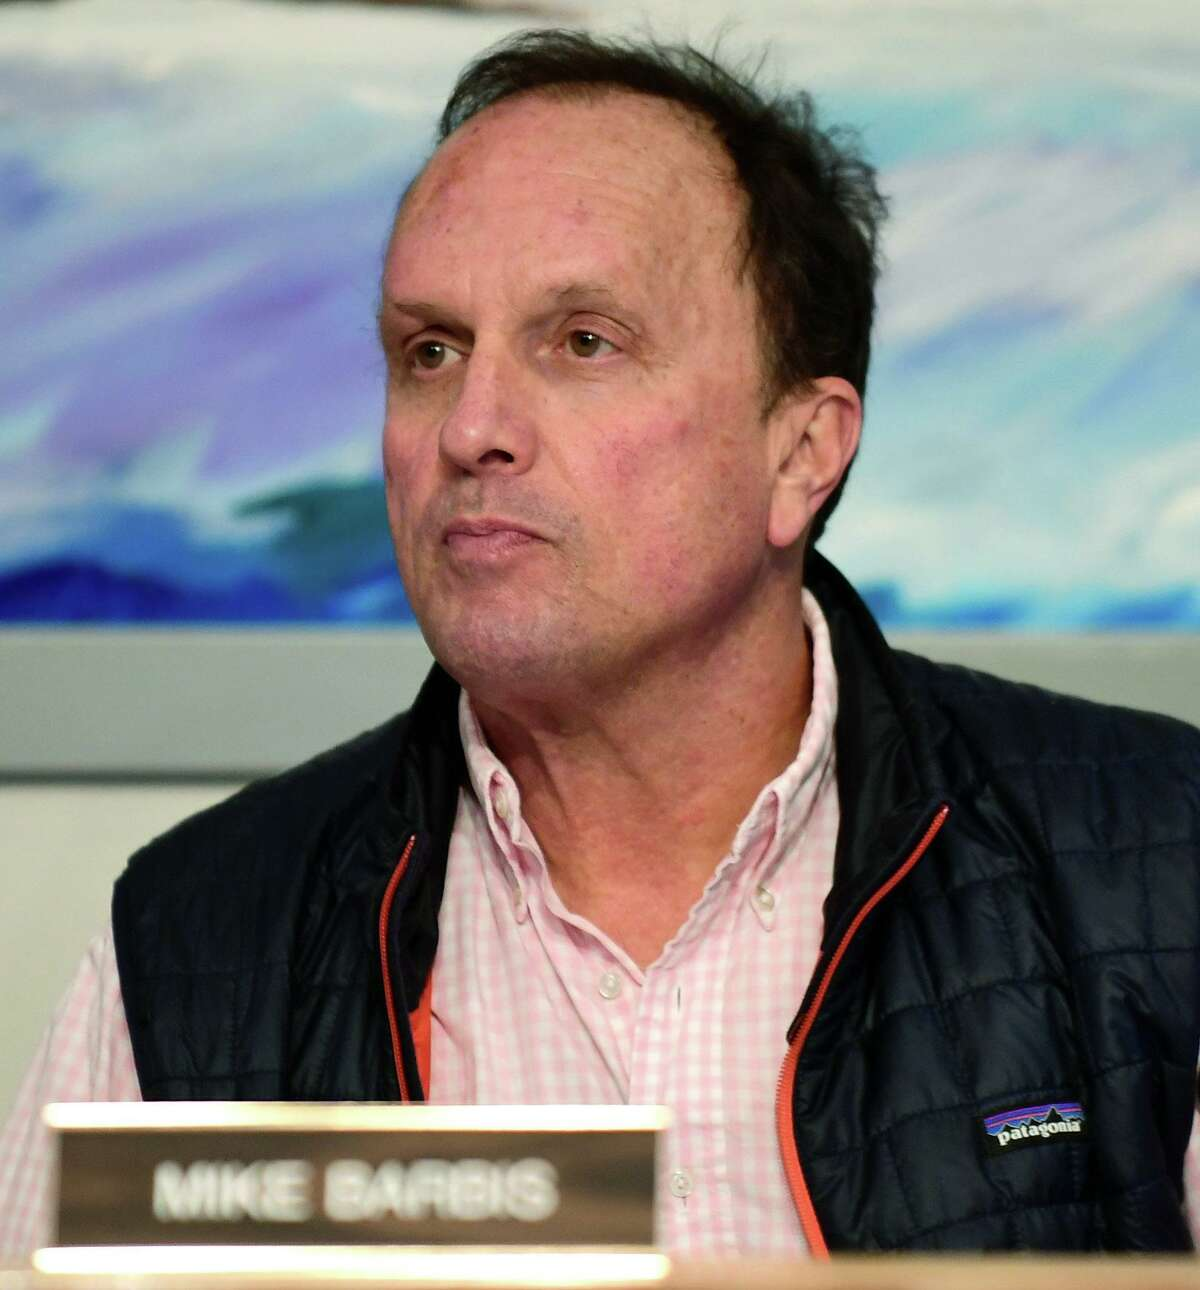 Norwalk Board of Education Chairman Mike Barbis